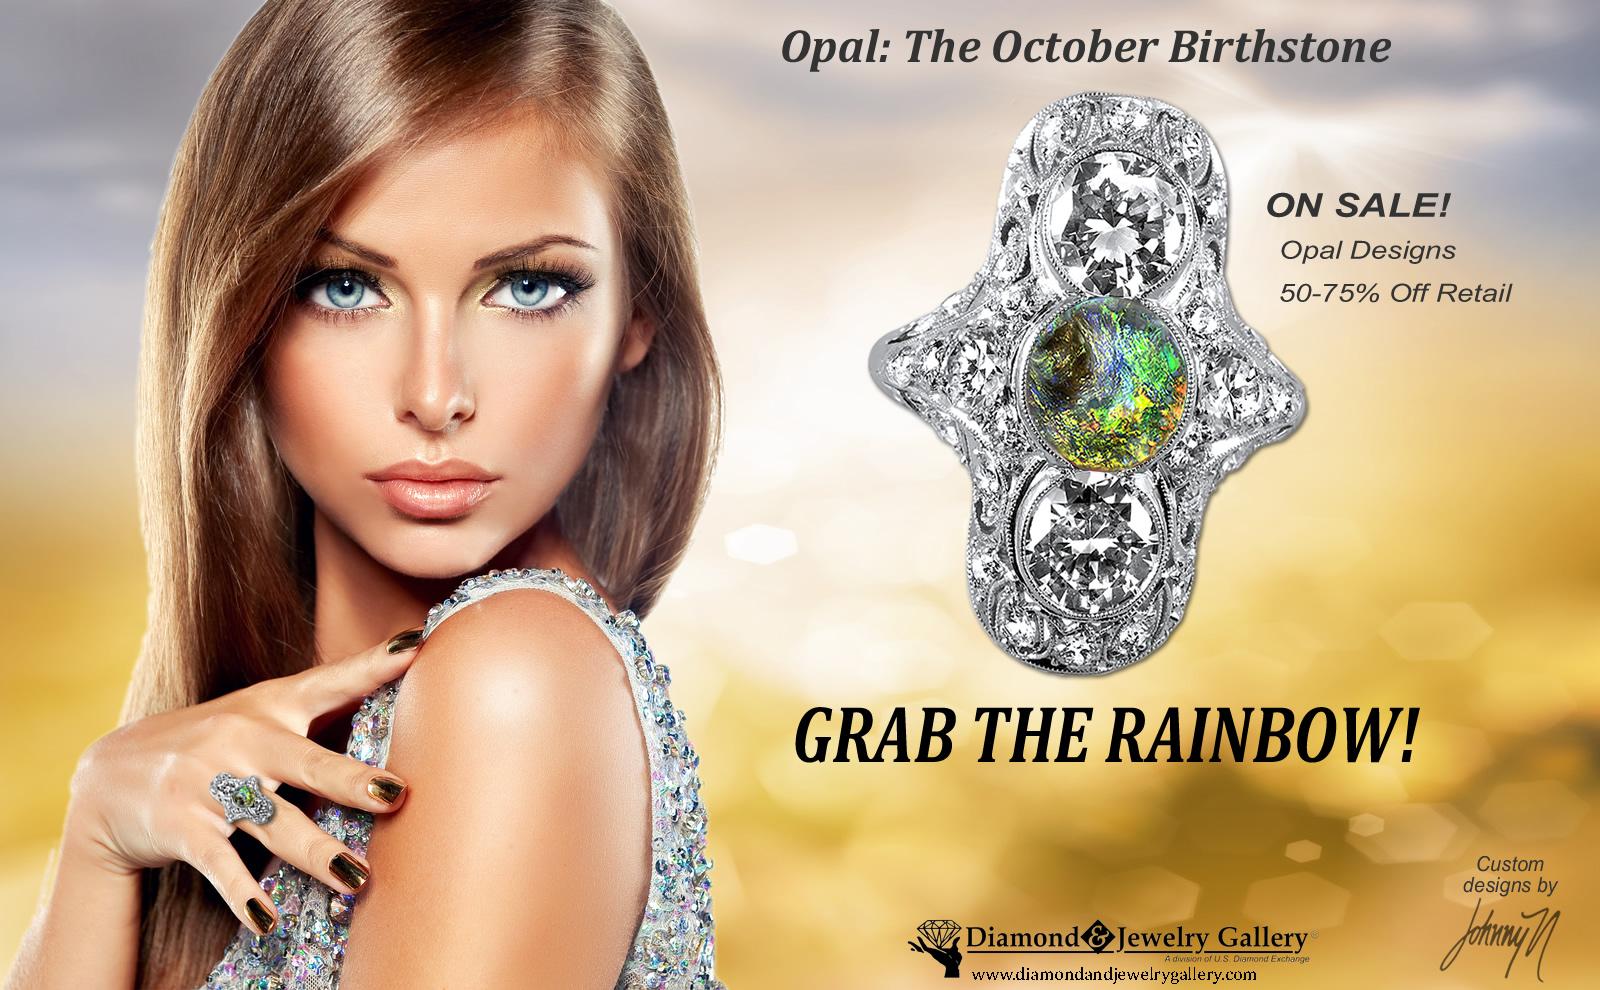 opal-ring-design-mockup-2-final